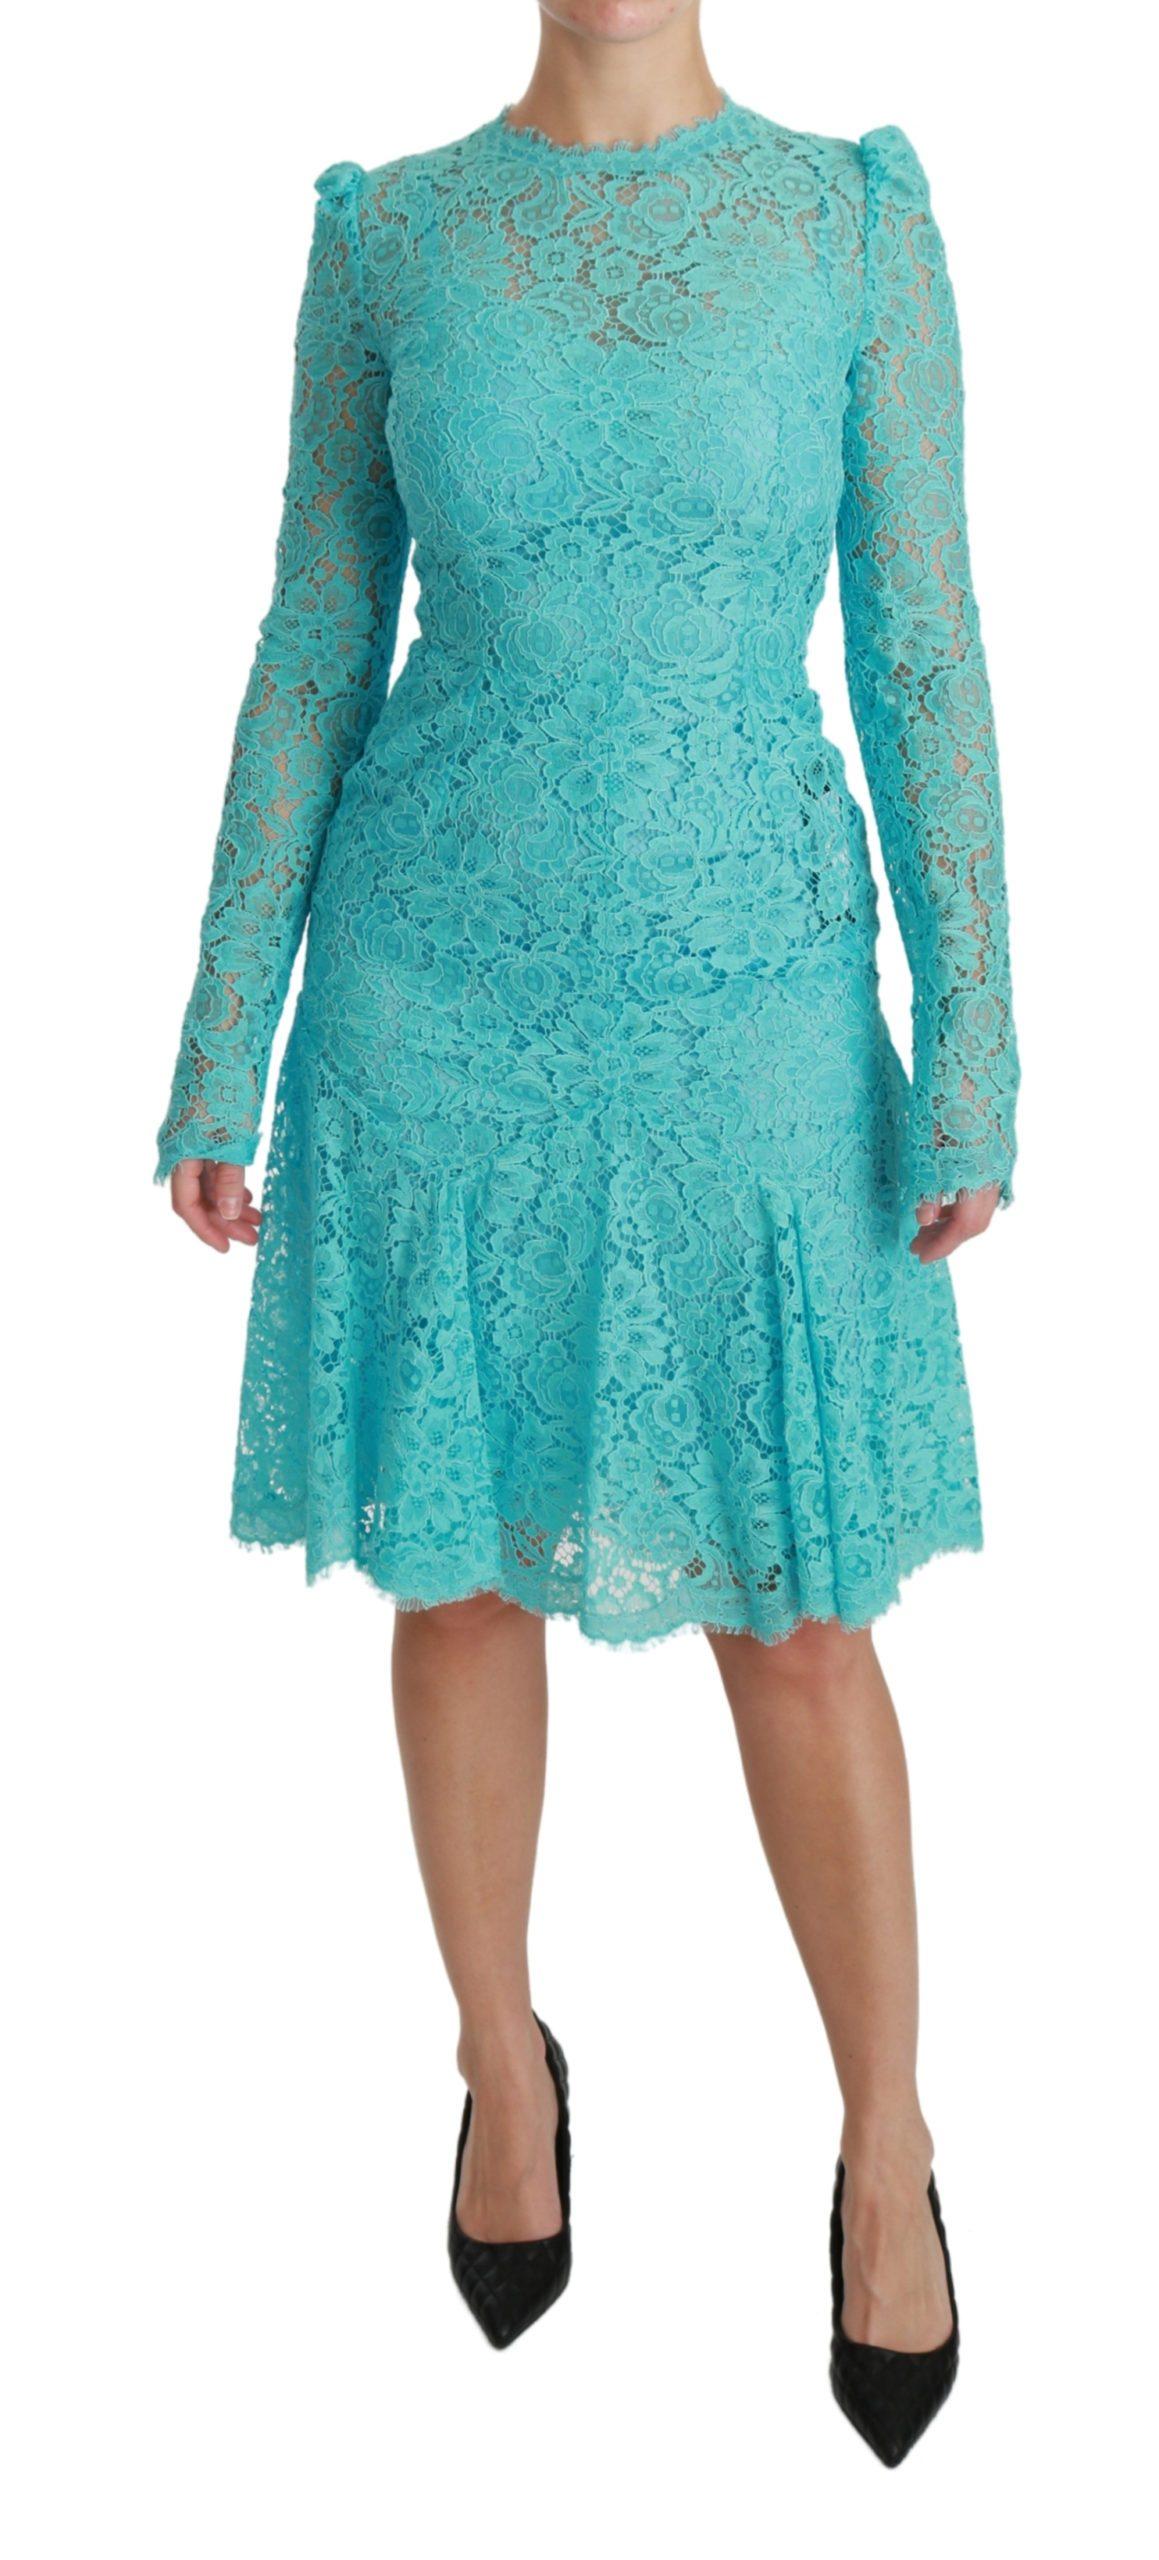 Dolce & Gabbana Women's Lace Knee Sheath Cotton Dress Light Blue DR2518 - IT40 S